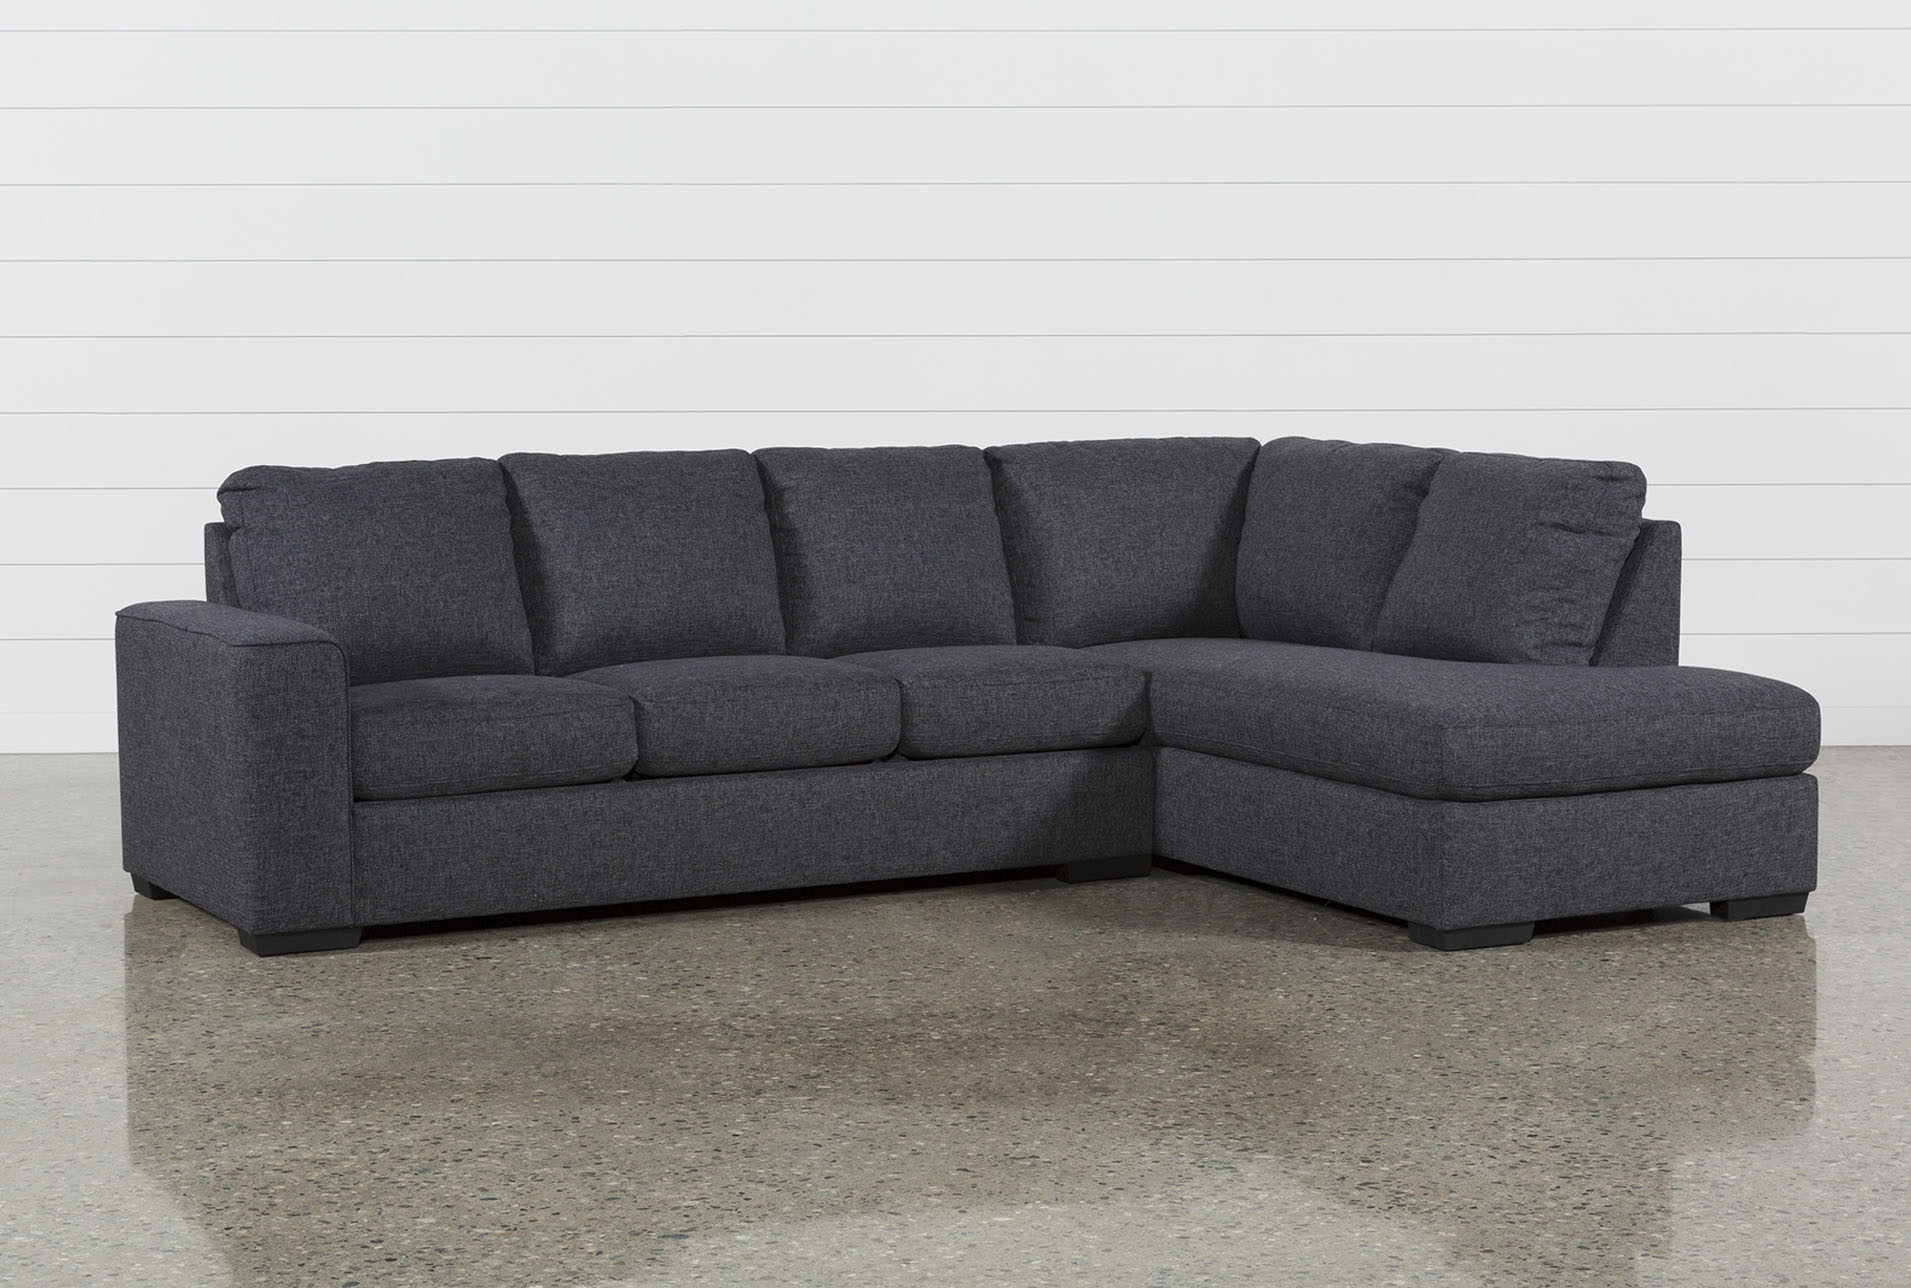 lucy dark grey 2 piece sleeper sectional w raf chaise living spaces rh livingspaces com sleeper sectional sofas sale sleeper sectional sofa canada